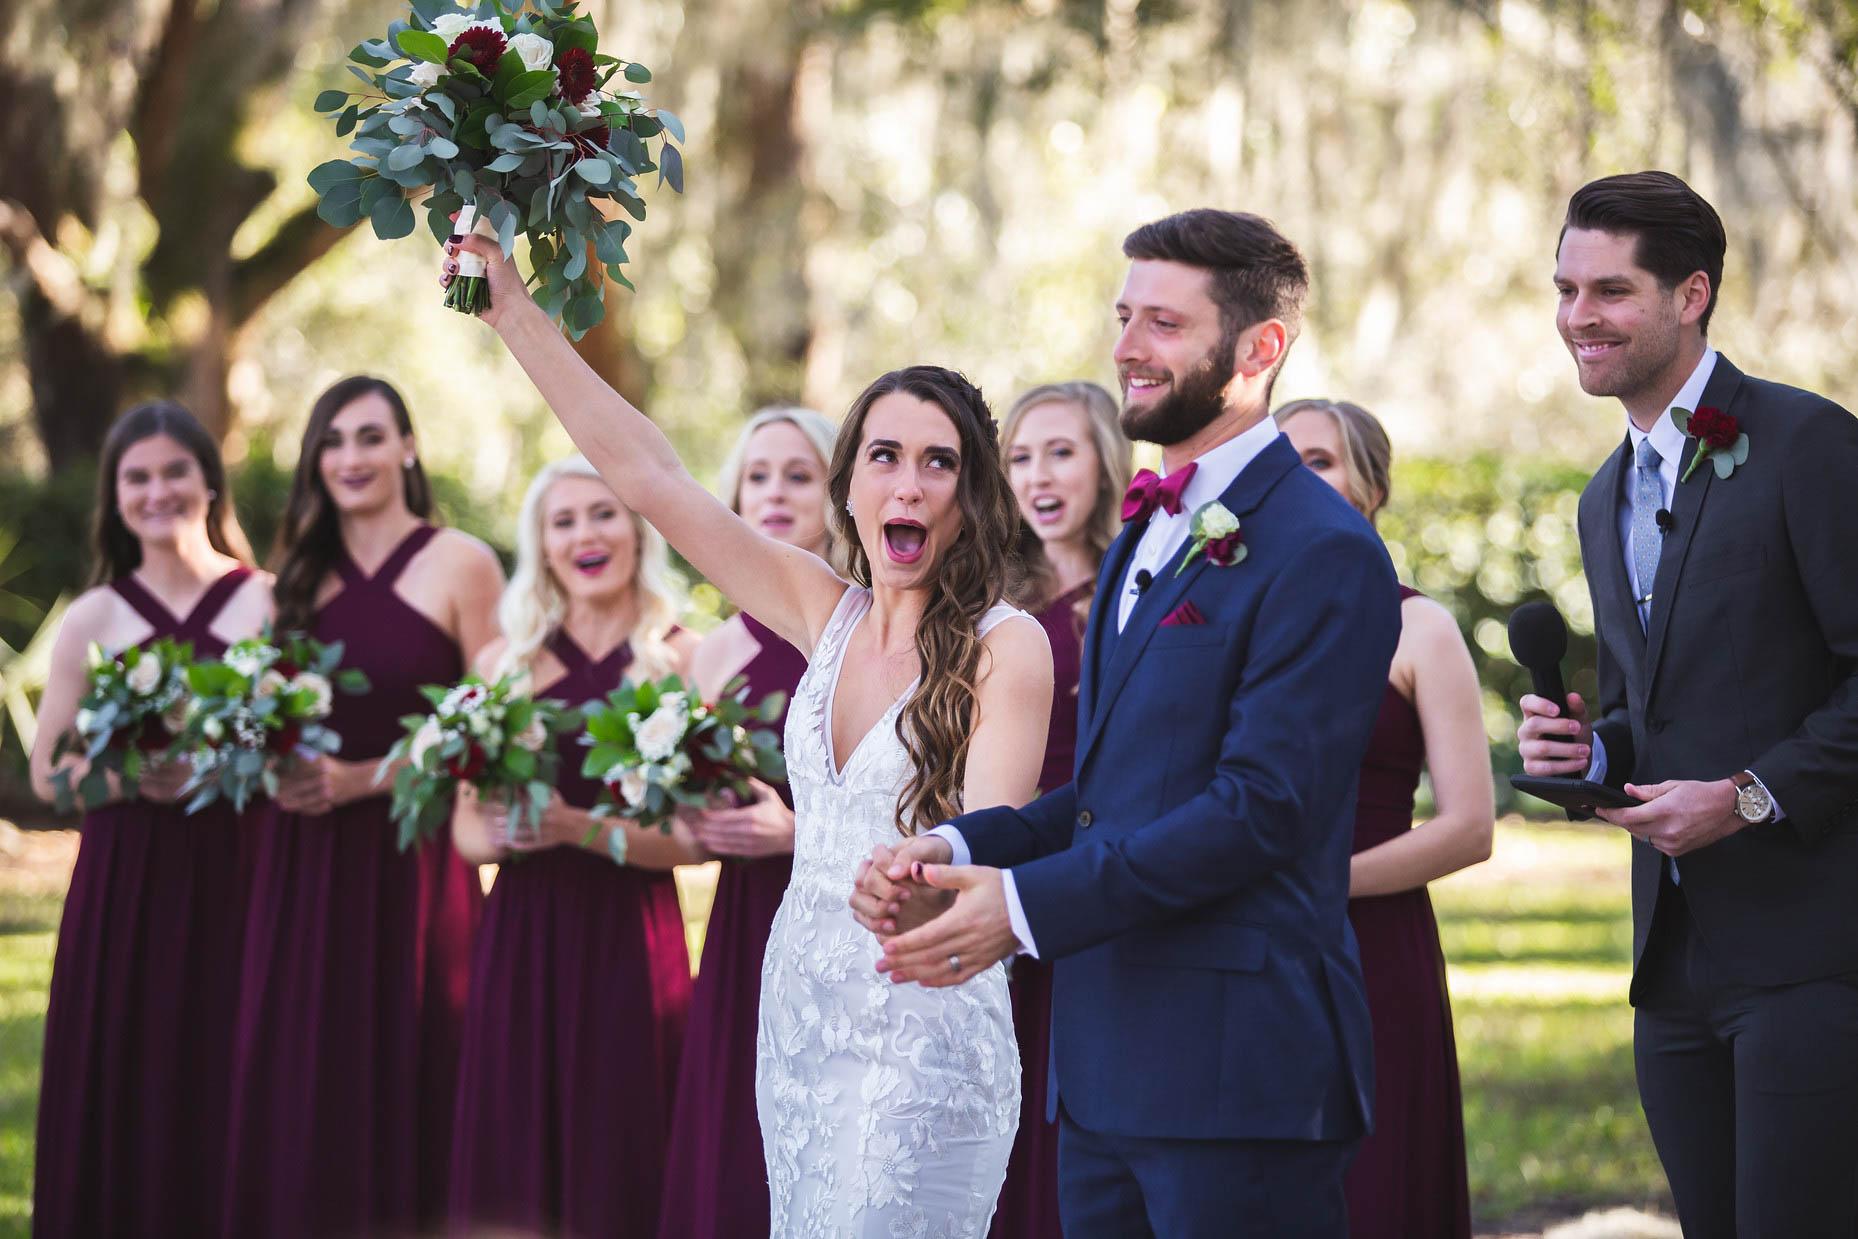 adam-szarmack-bowing-oaks-wedding-photographer-jacksonville-85.jpg